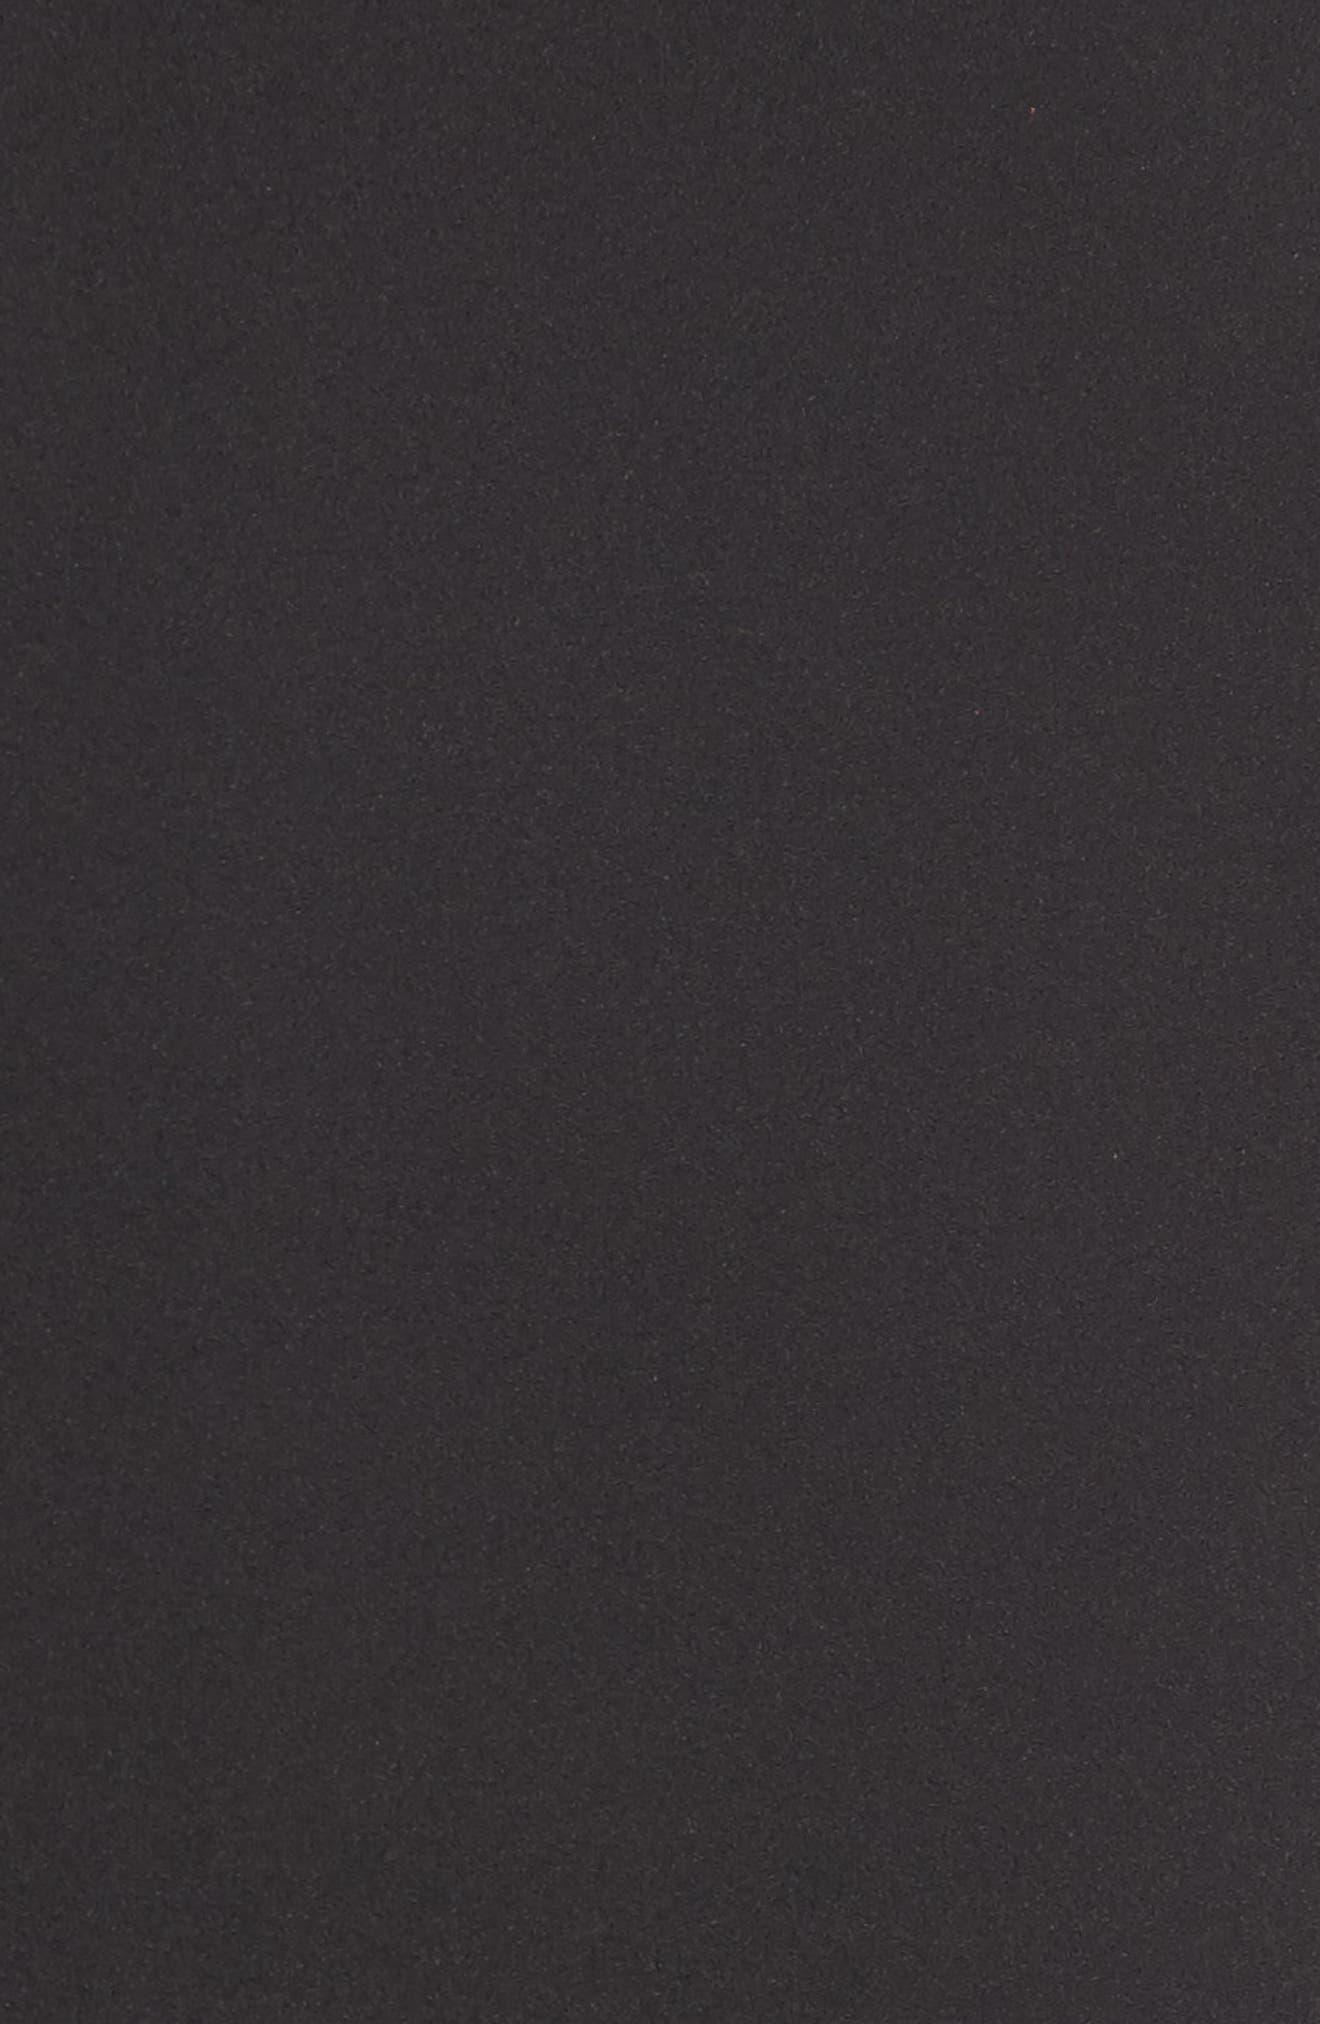 Ruffle Sleeveless Dress,                             Alternate thumbnail 5, color,                             001